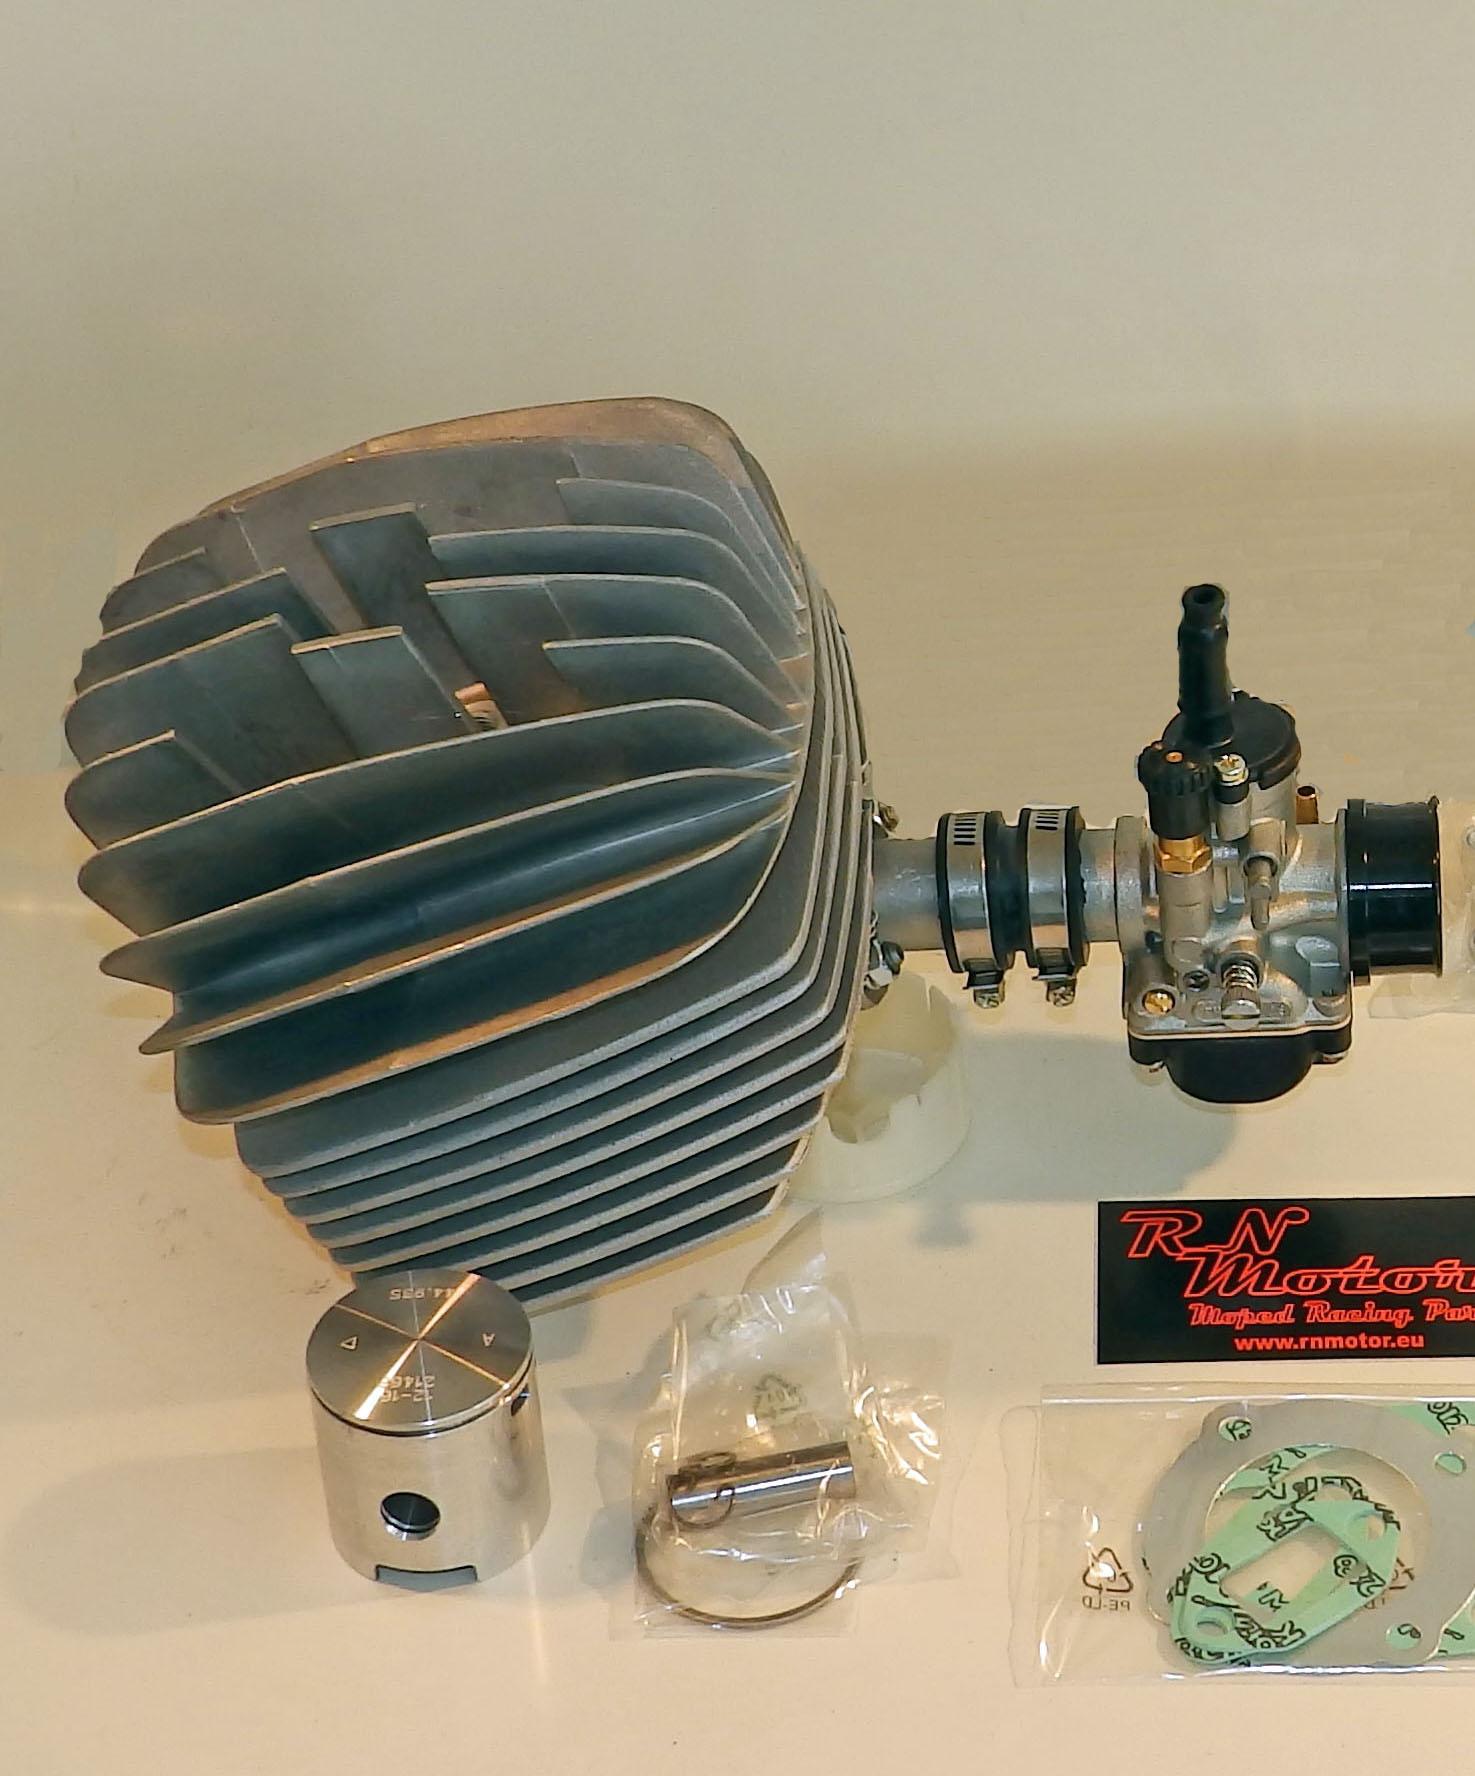 70cc Athena Minitherm tuning kit, sunfeather, Mini